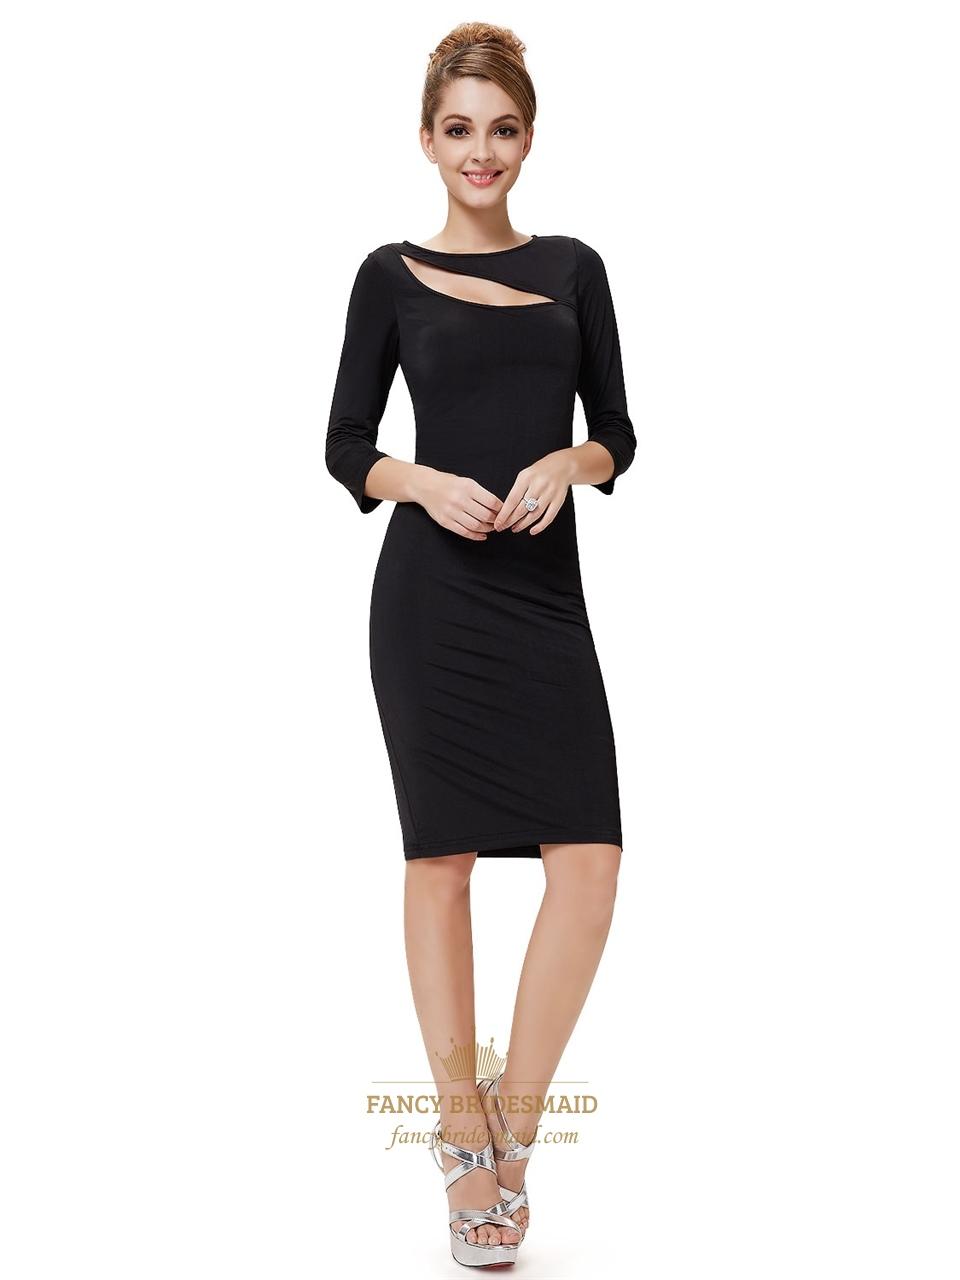 e72a6c25d732 Black Mini Dress With Long Sleeves